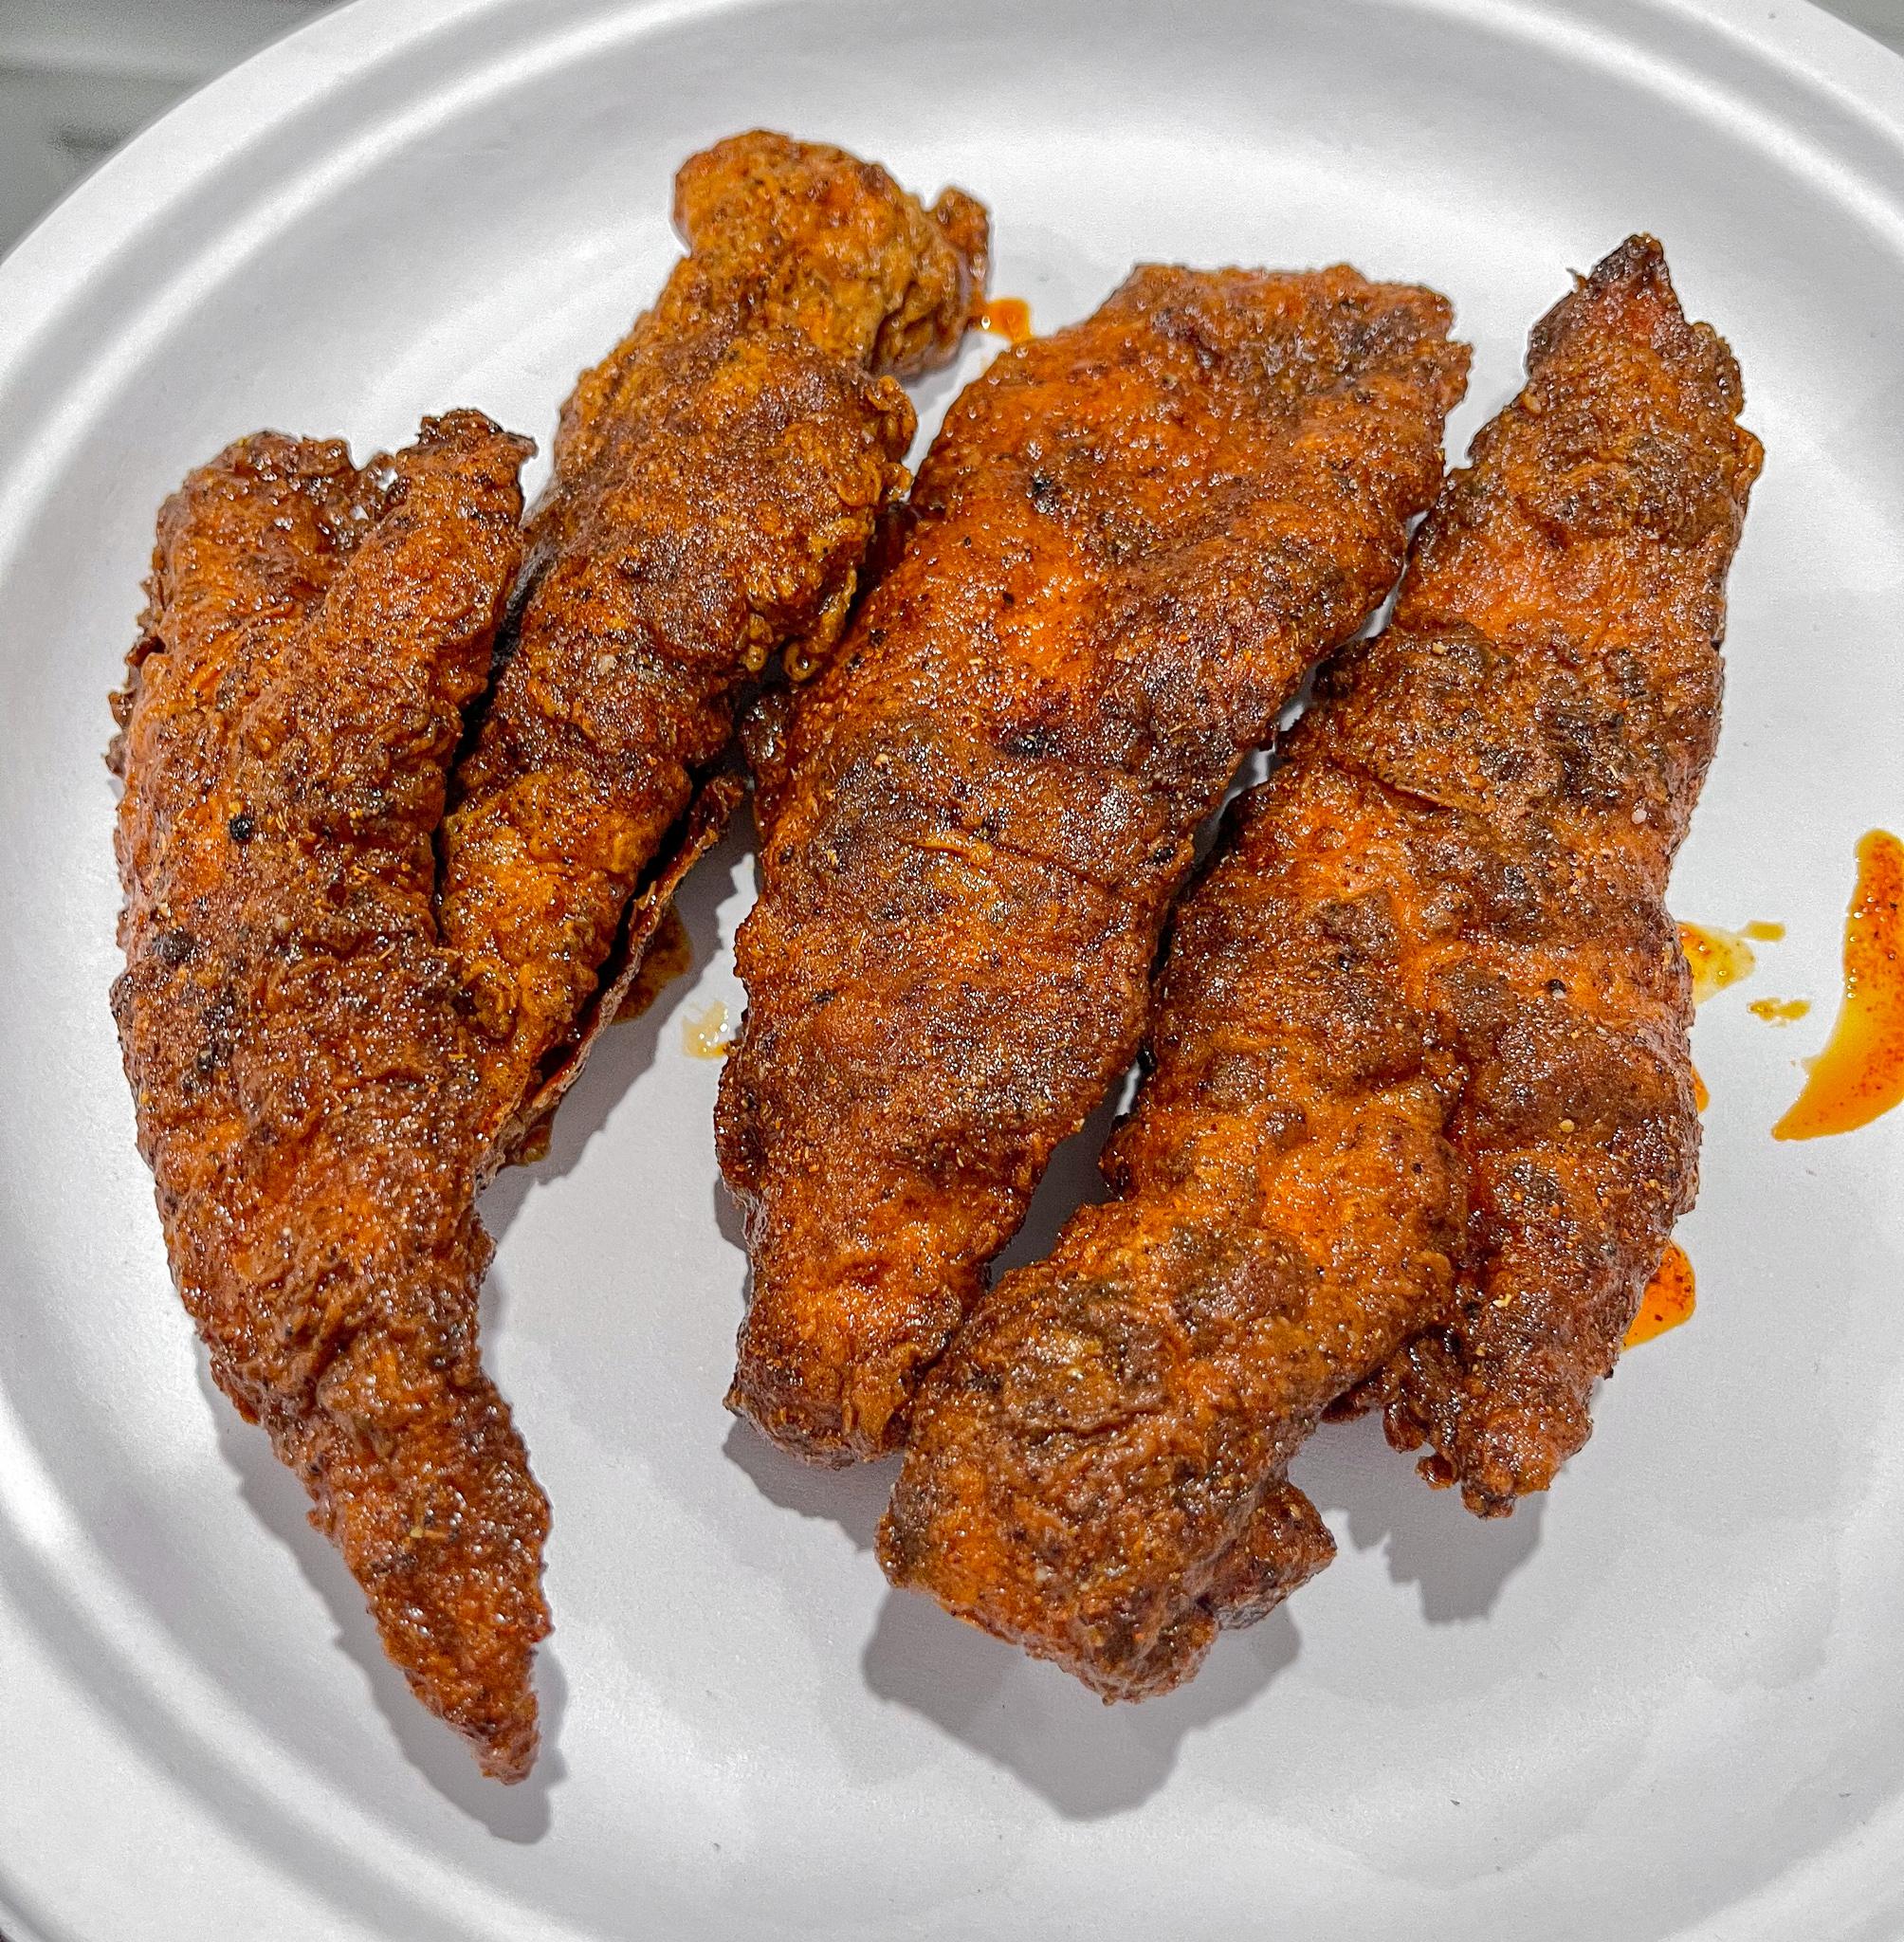 Prince's Nashville Hot Chicken Inspired Recipe